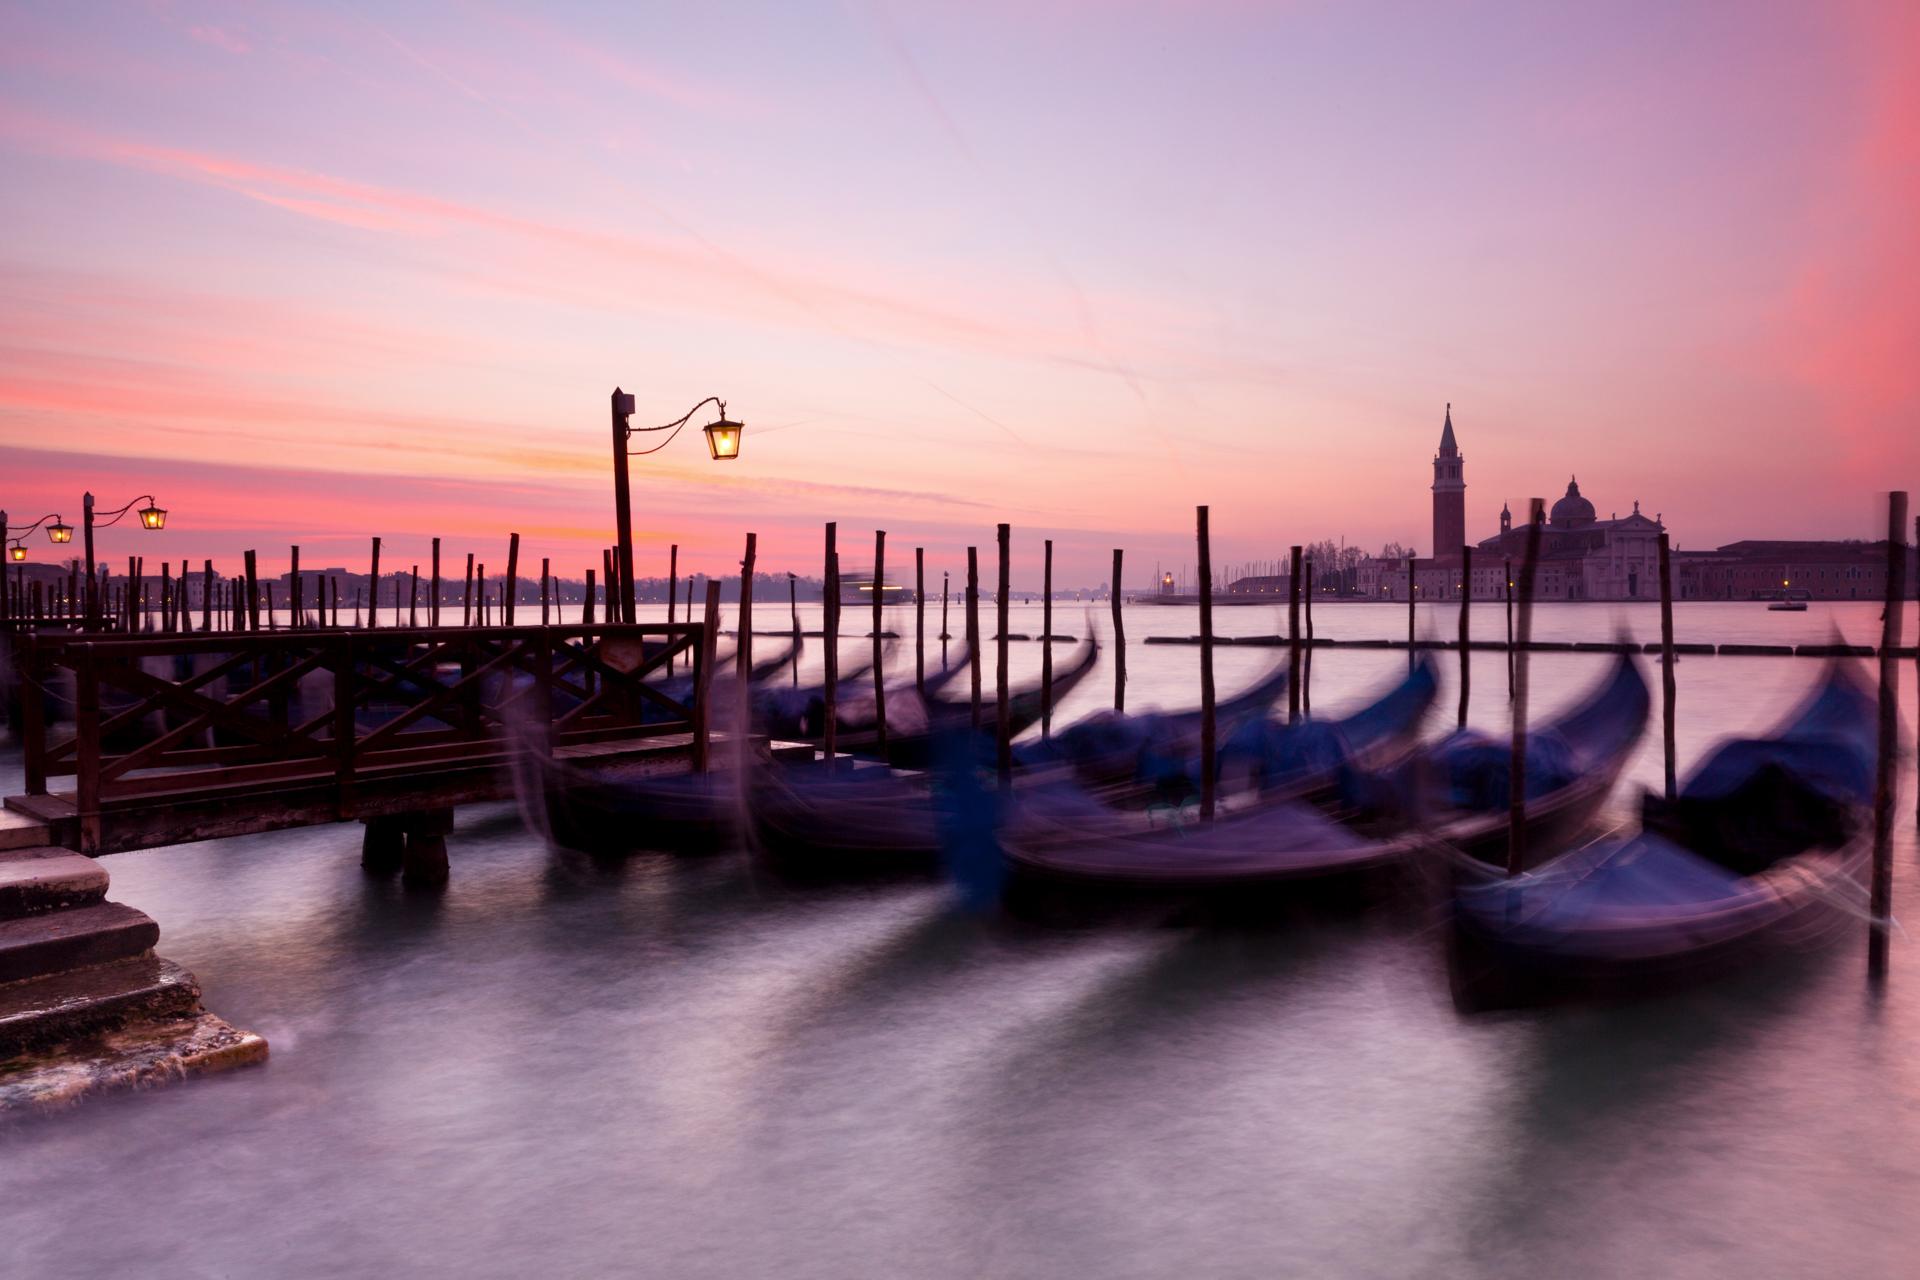 Venice at dusk in sRGB color profile